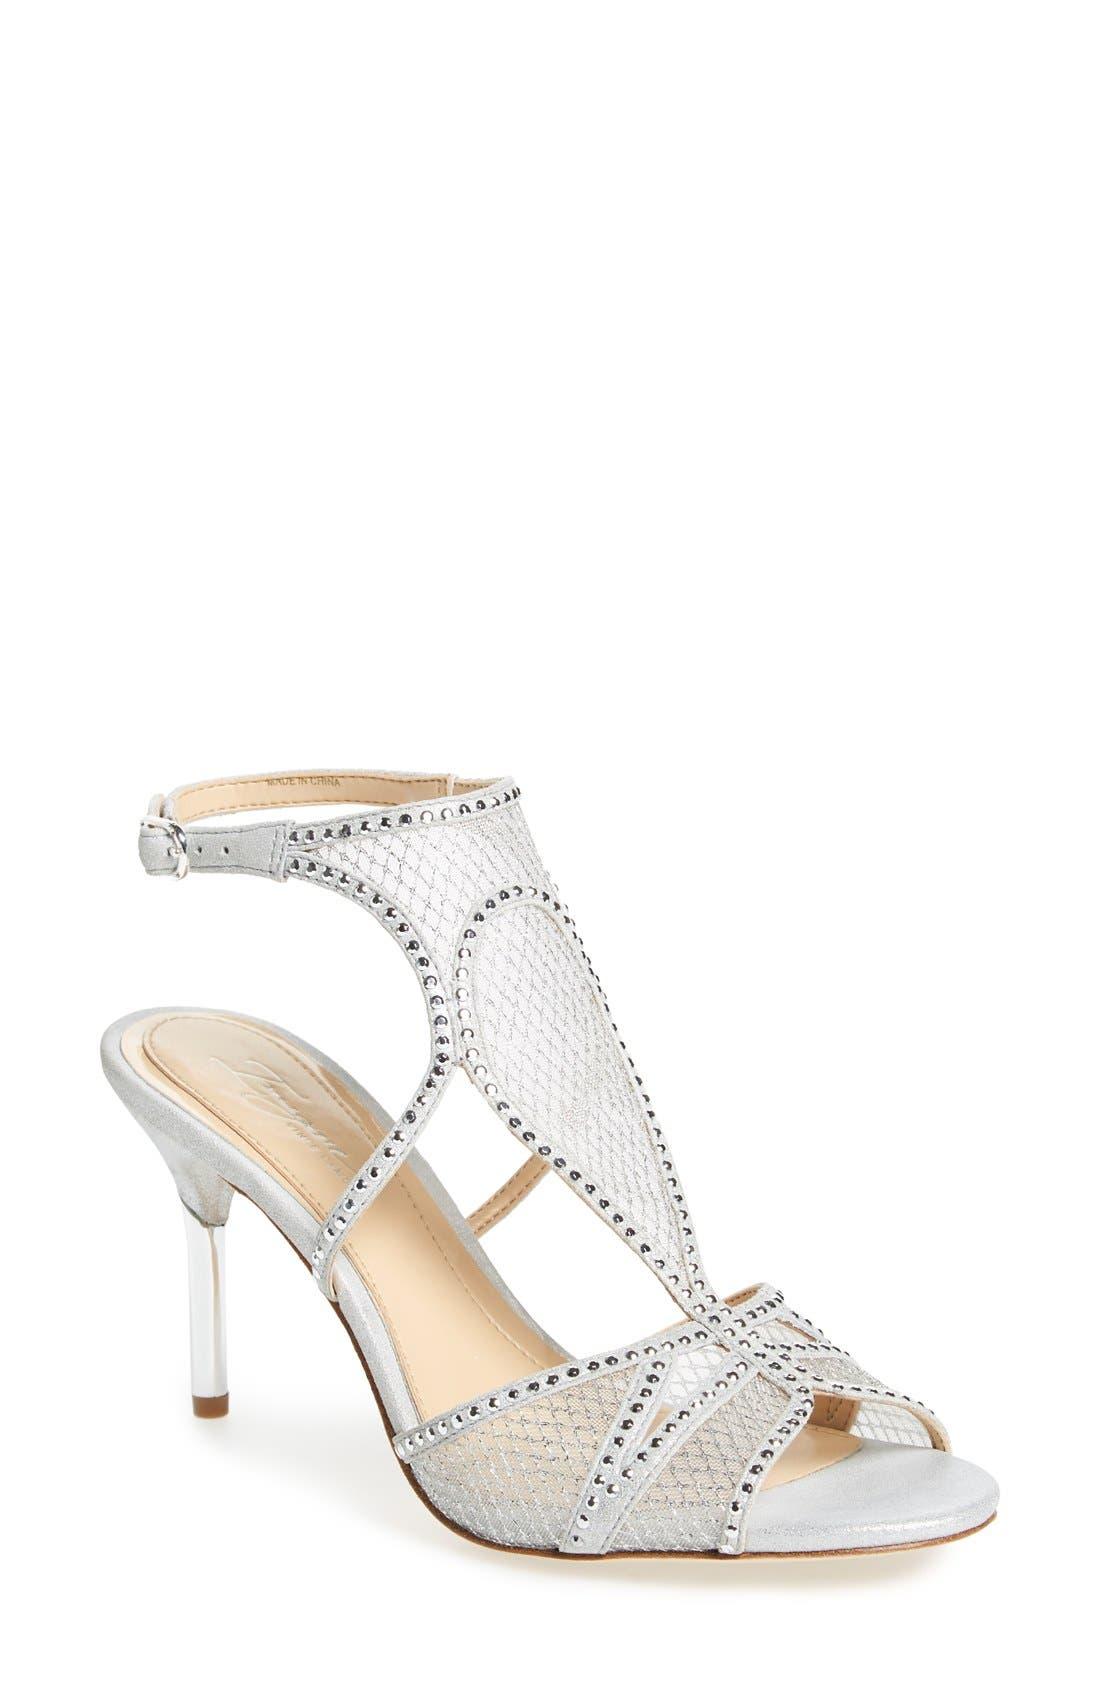 Imagine by Vince Camuto 'Pember' Sandal (Women)